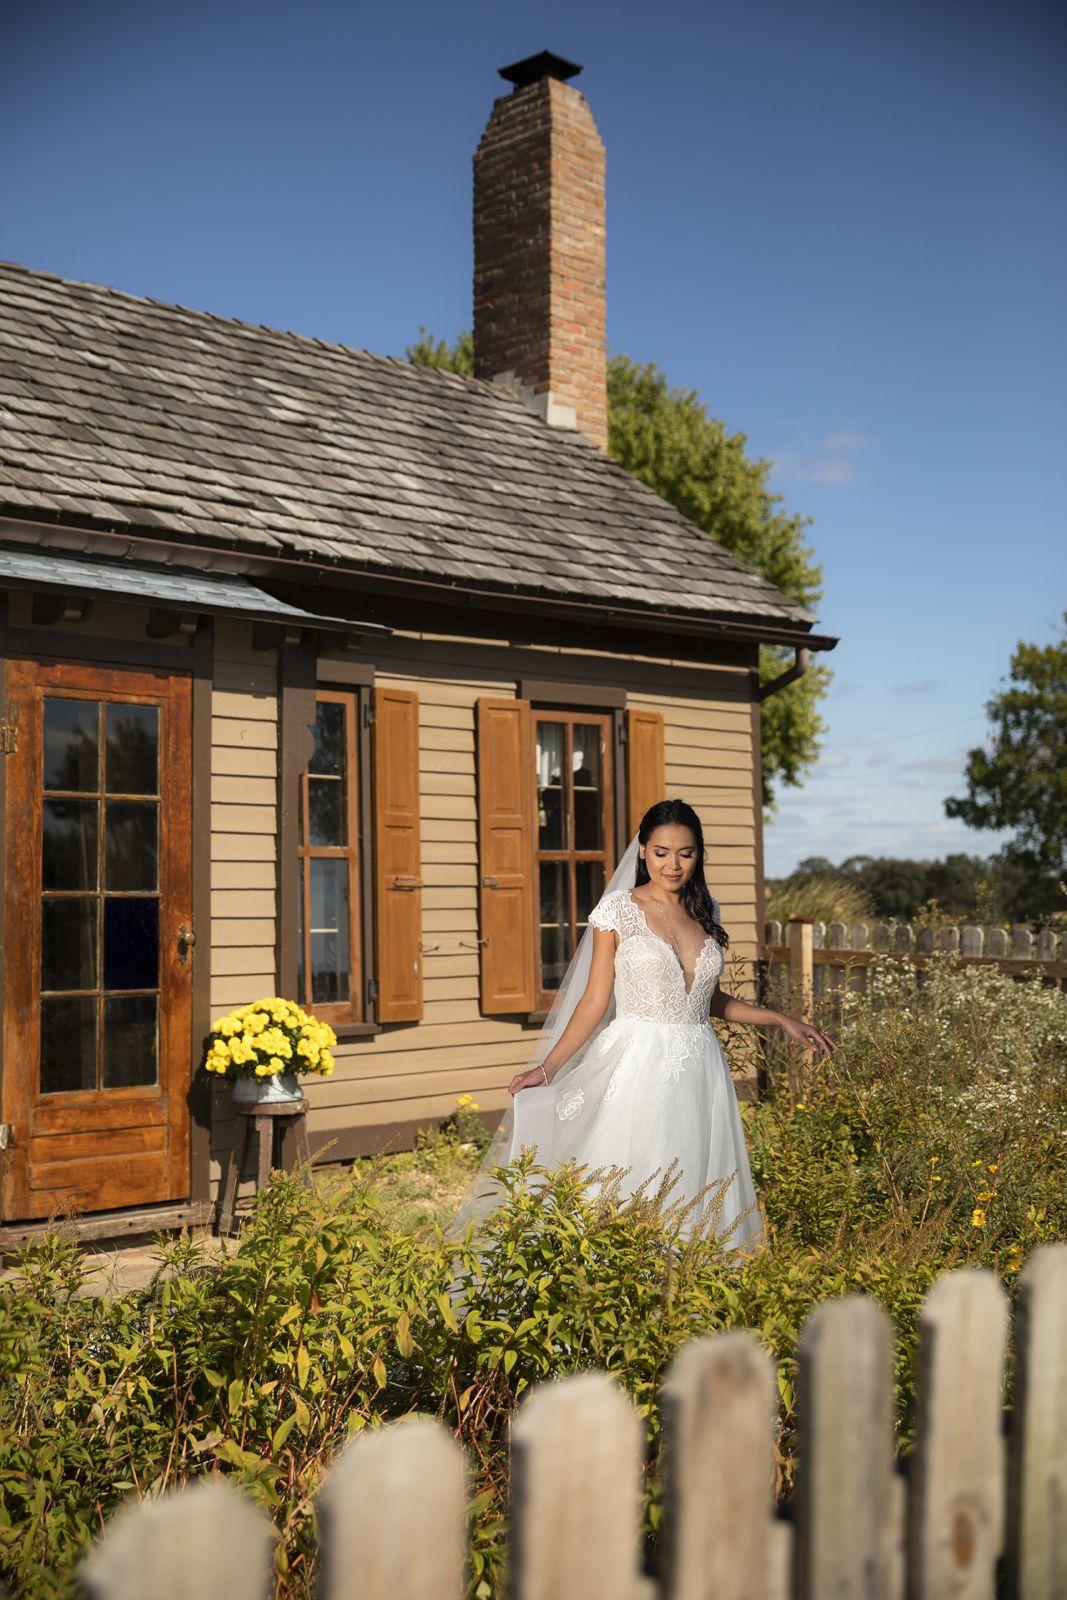 Bride in the wildflowers in 2020 Barn wedding reception